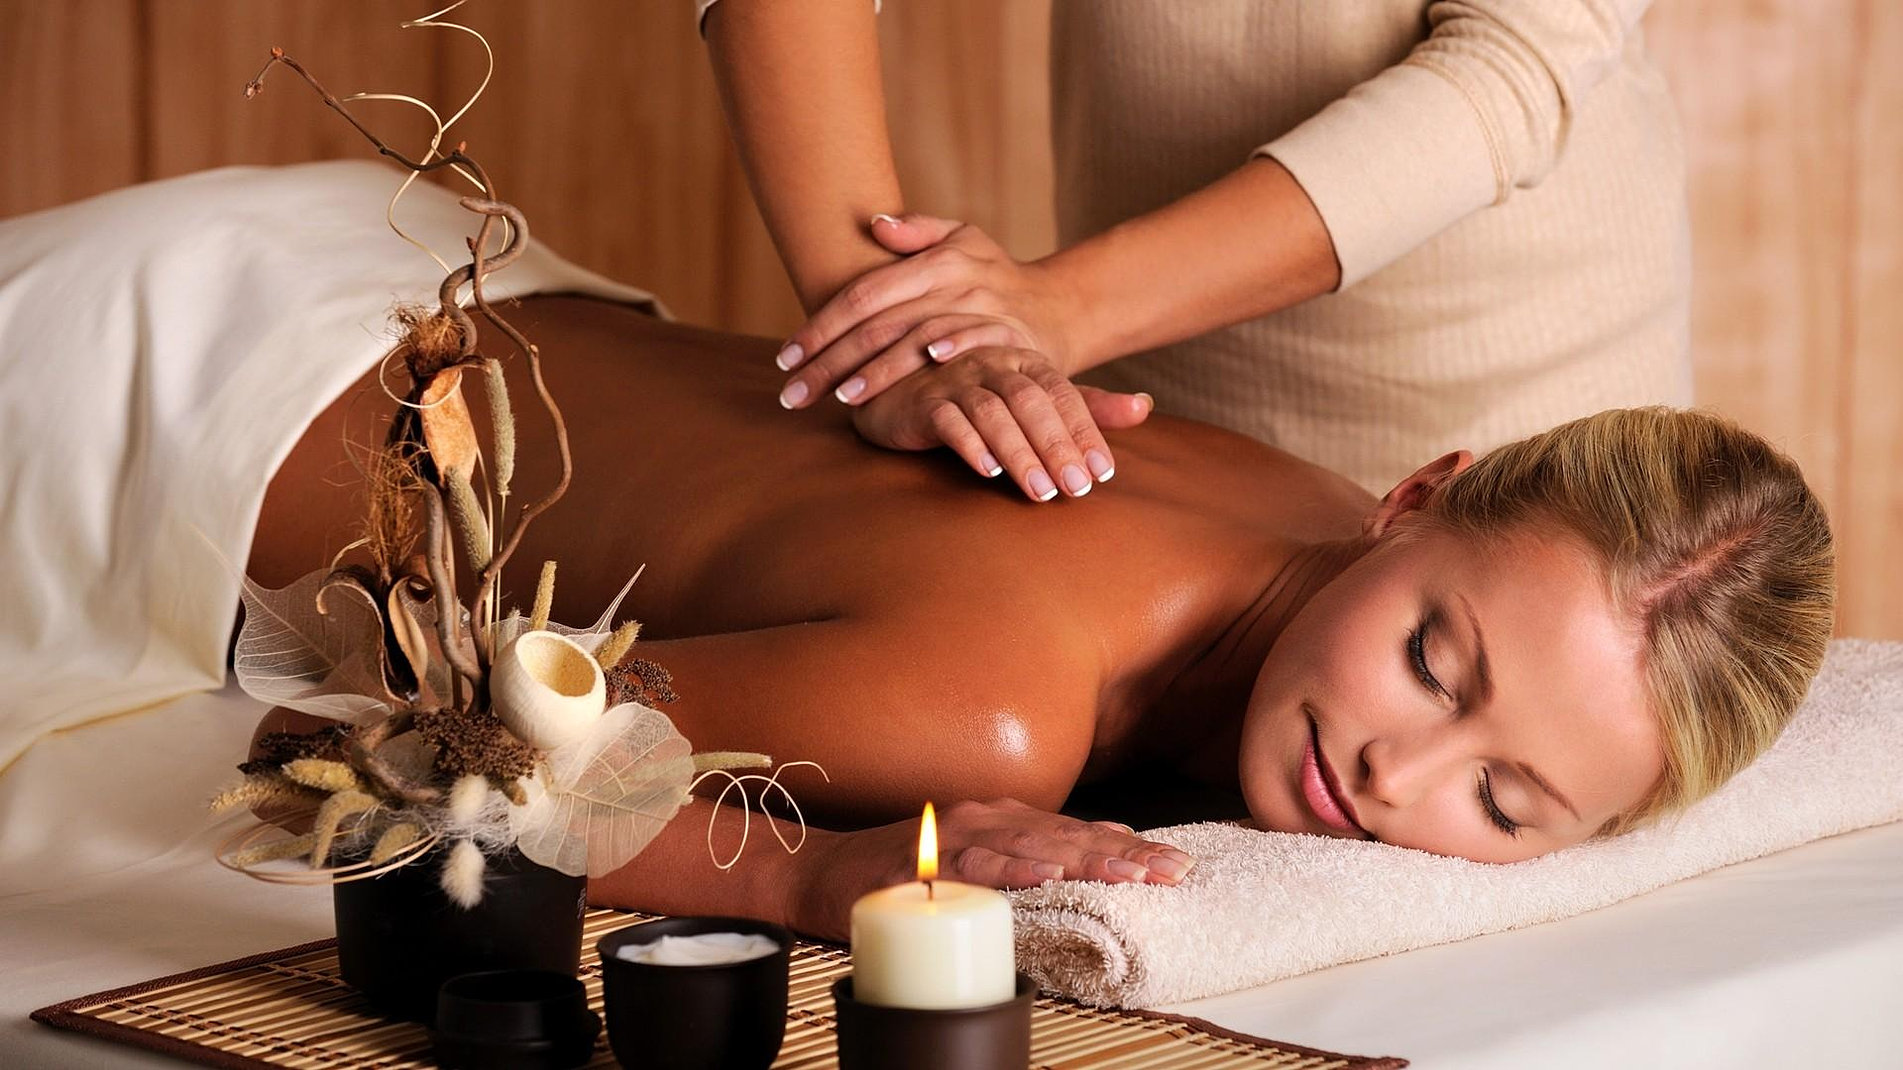 Тайский массаж онлайн 23 фотография